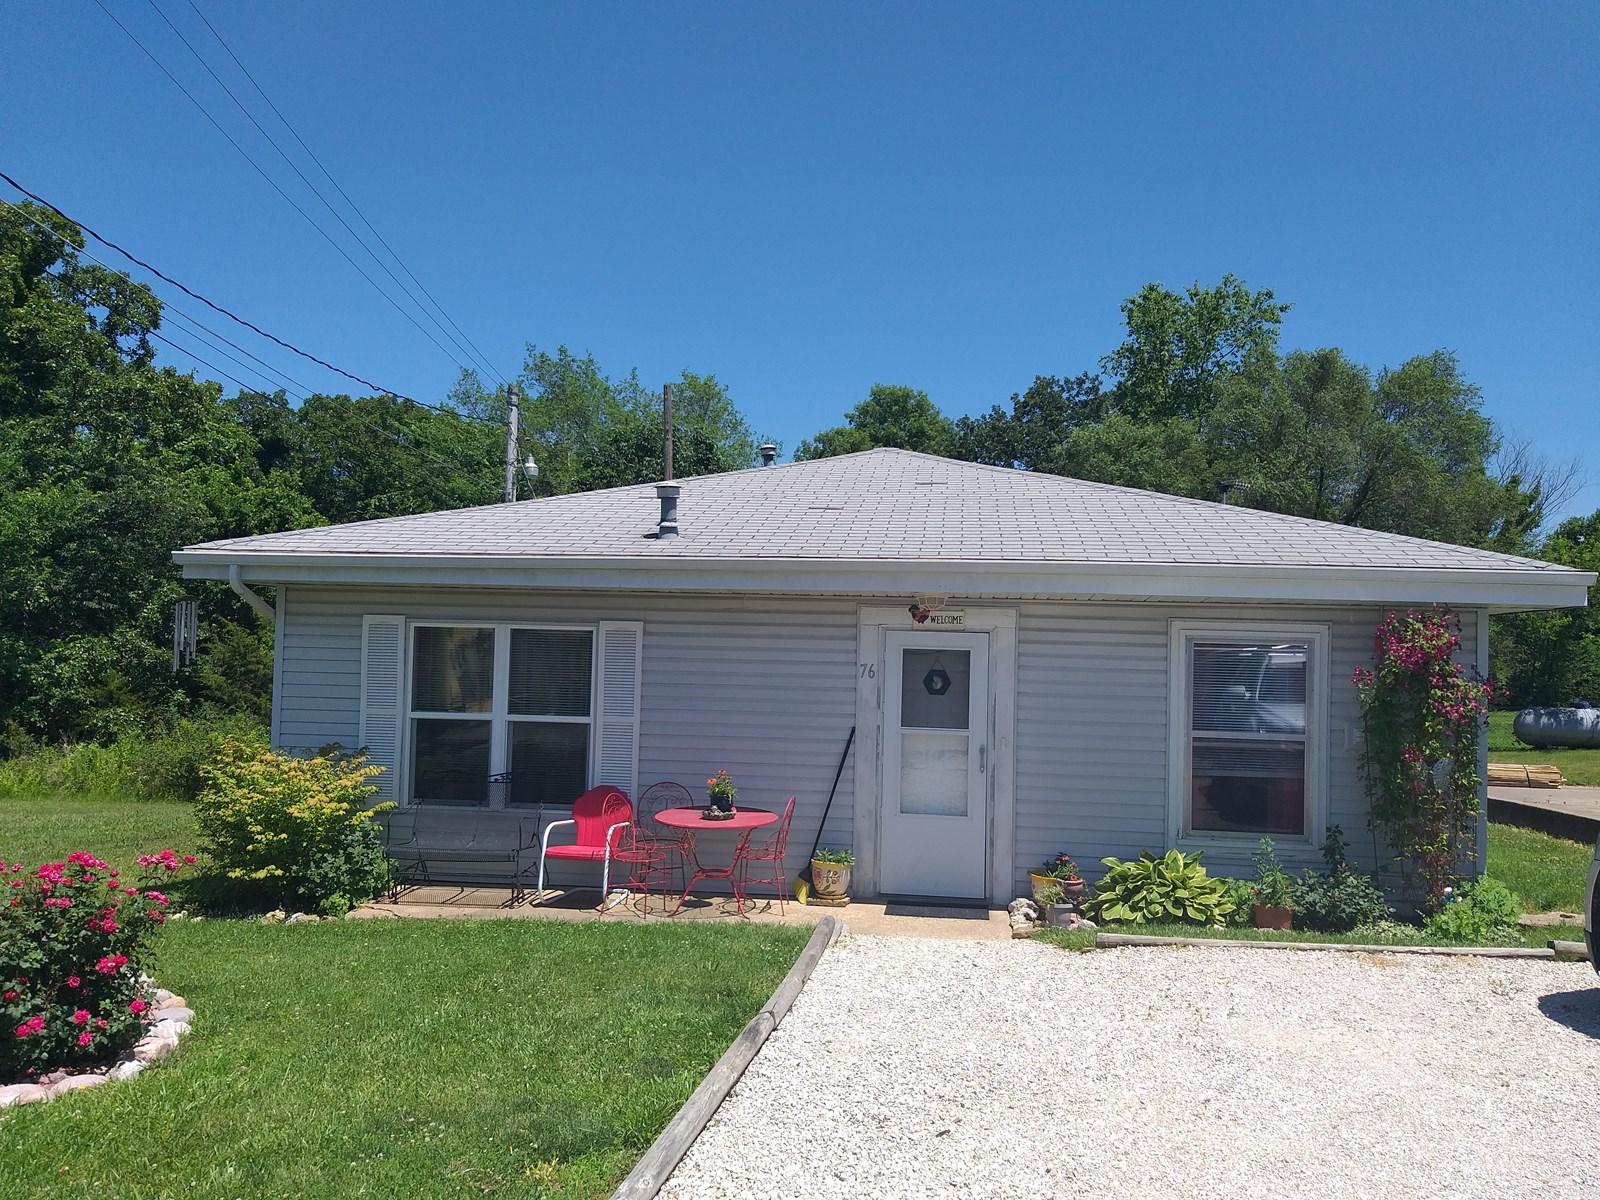 Home in Camdenton, MO for sale